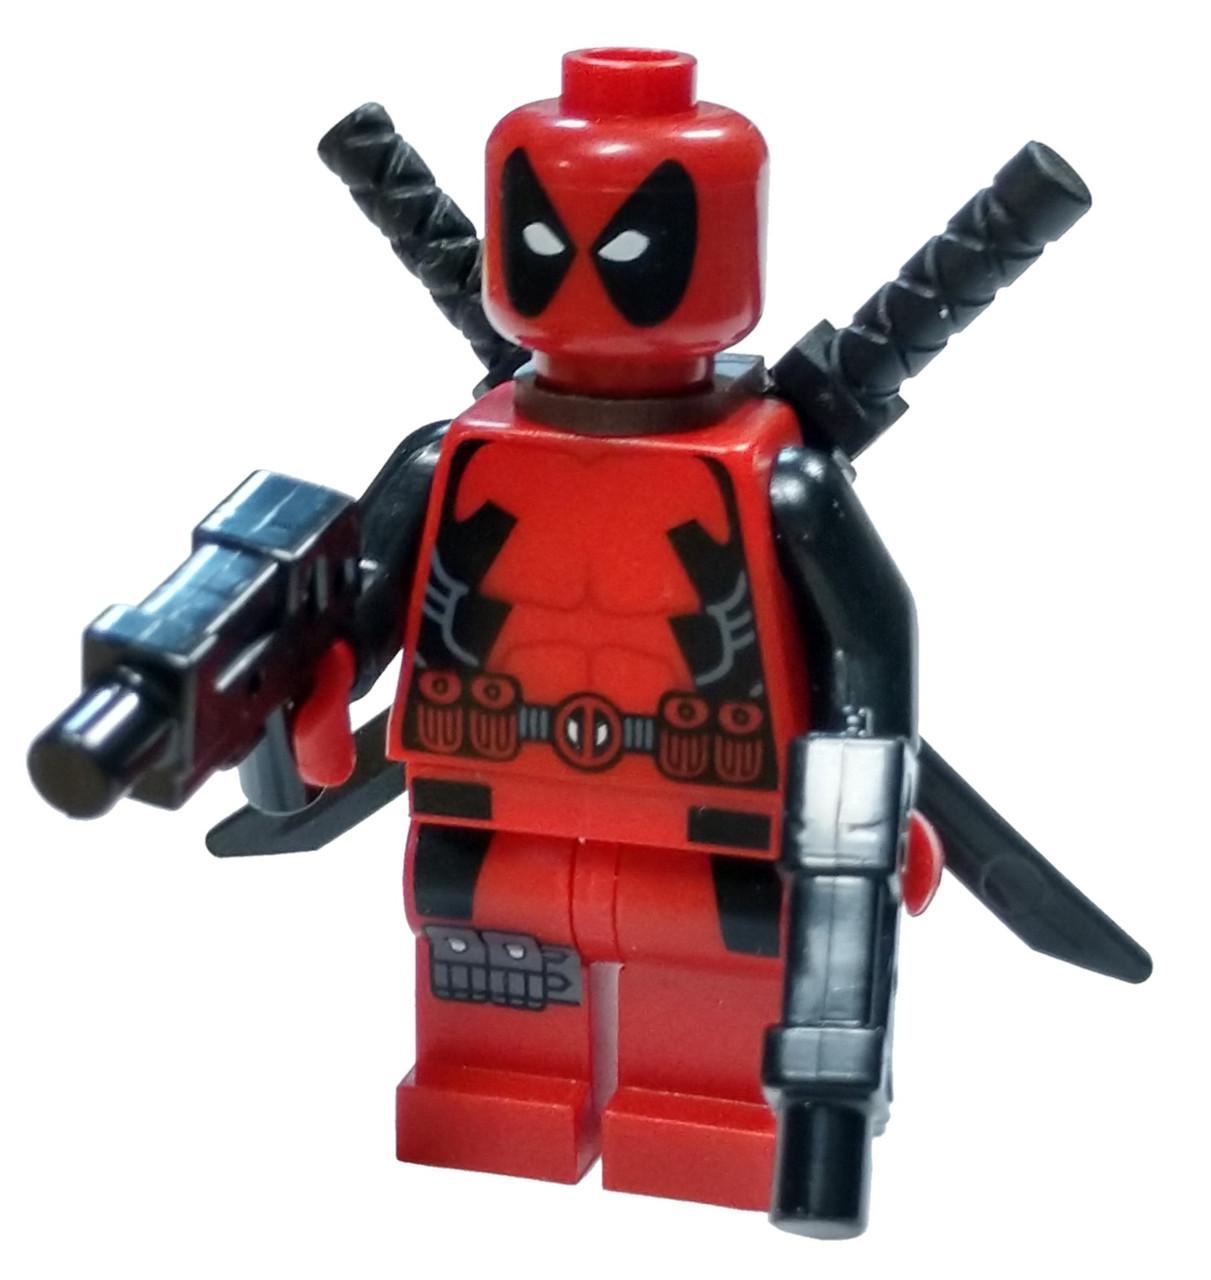 Awesome LEGO Deadpool™ Minifigure Marvel Super Heroes ... |Lego Marvel Superheroes Deadpool Set